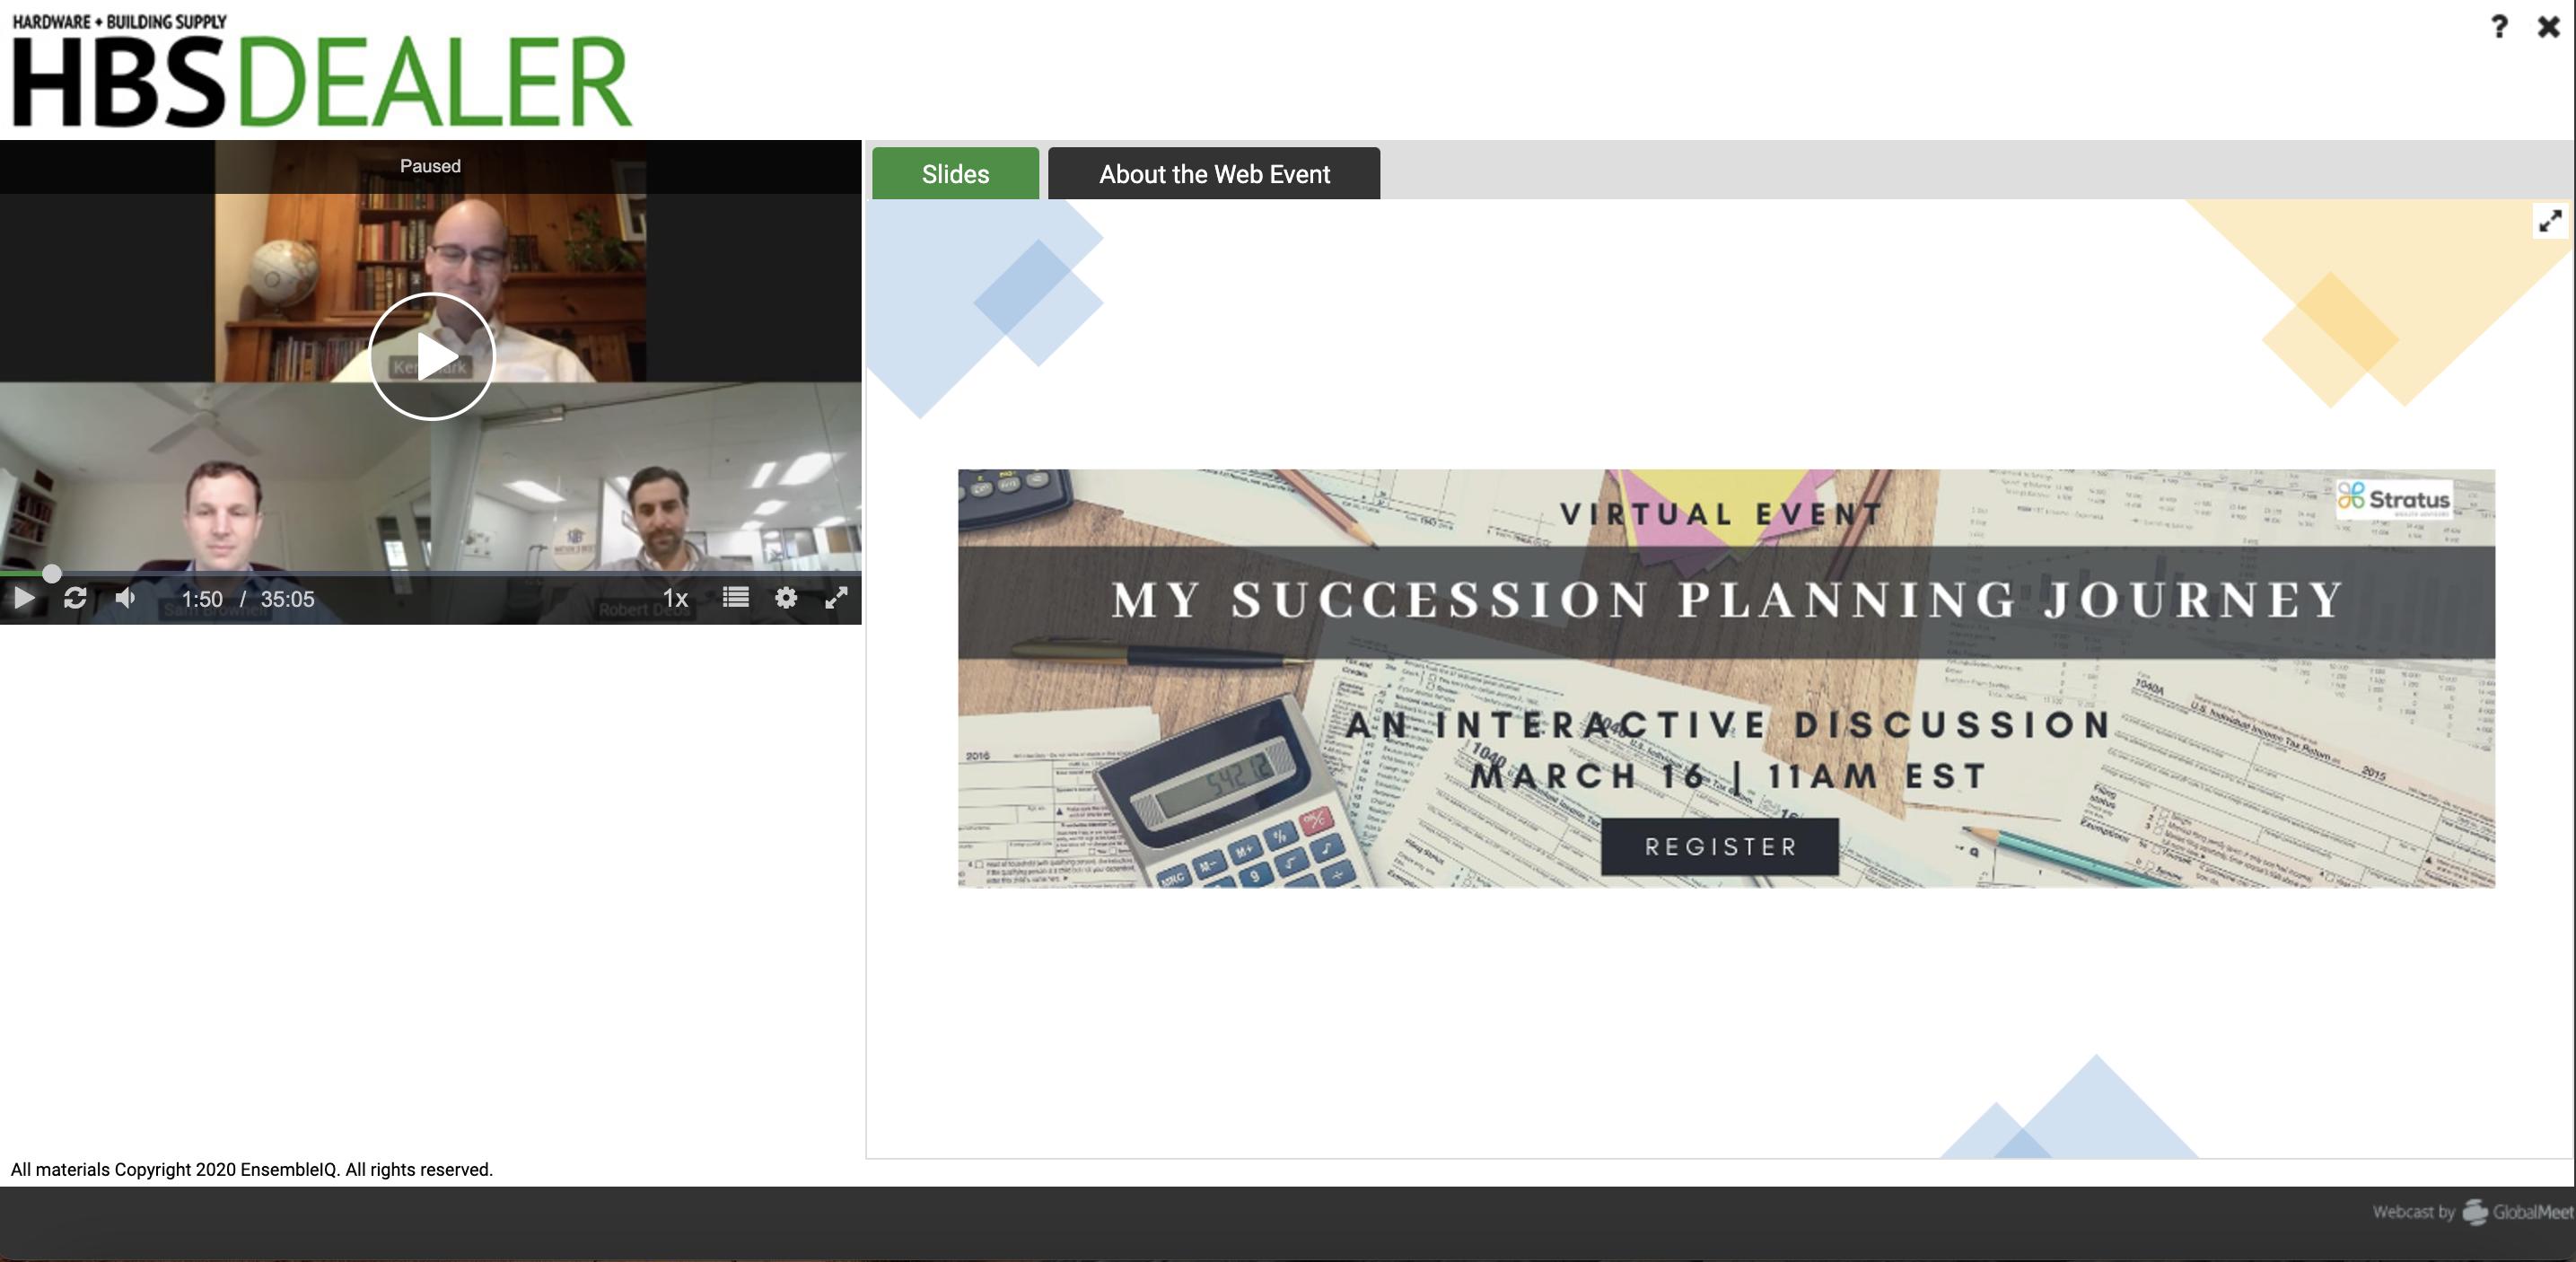 HBSDealer Webinar: My Succession Planning Journey